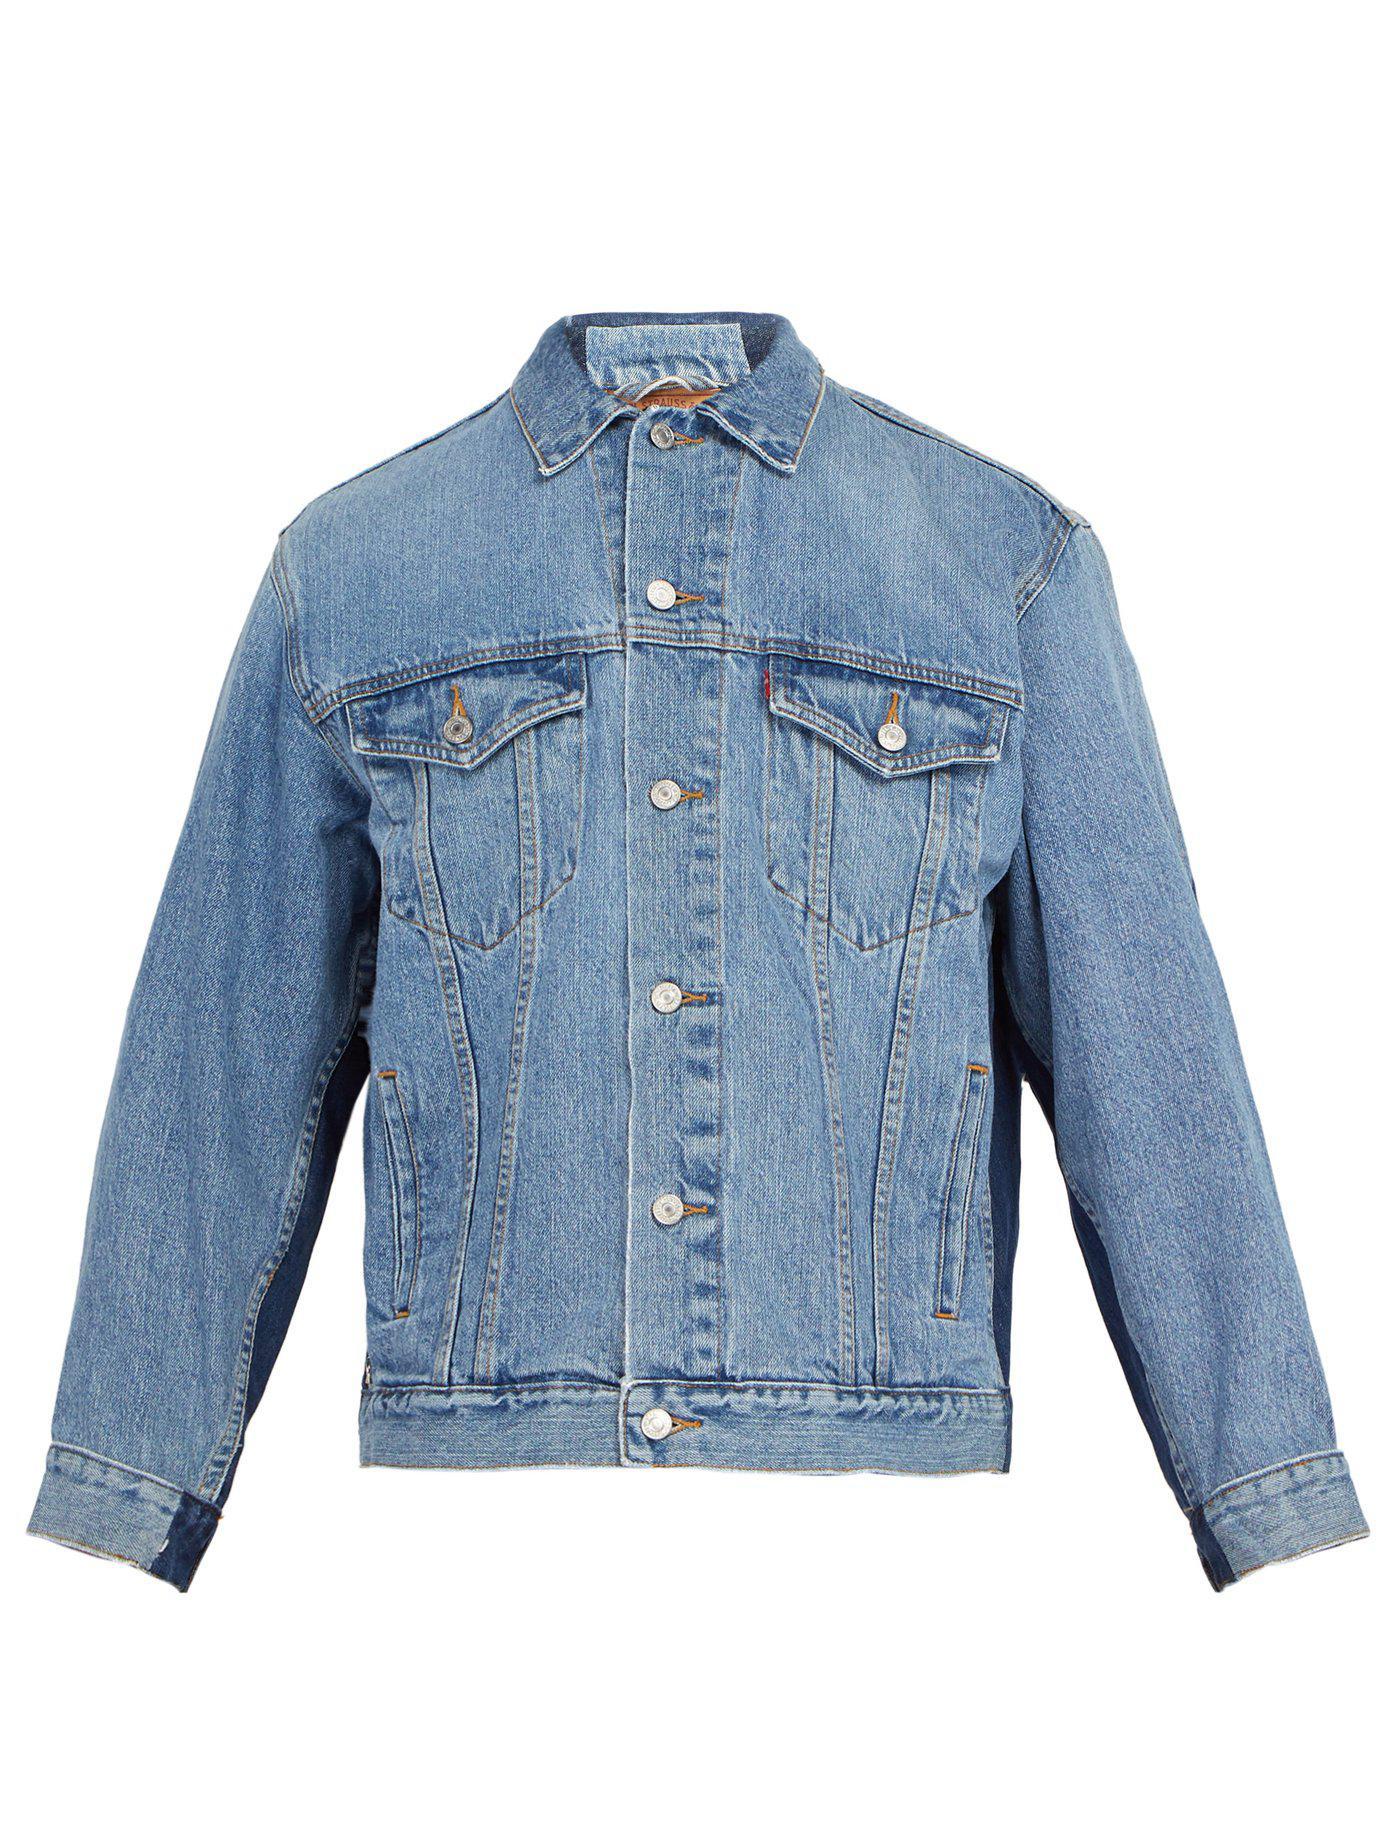 601309da Bless X Maryam Nassir Zadeh Deconstructed Denim Jacket in Blue for ...